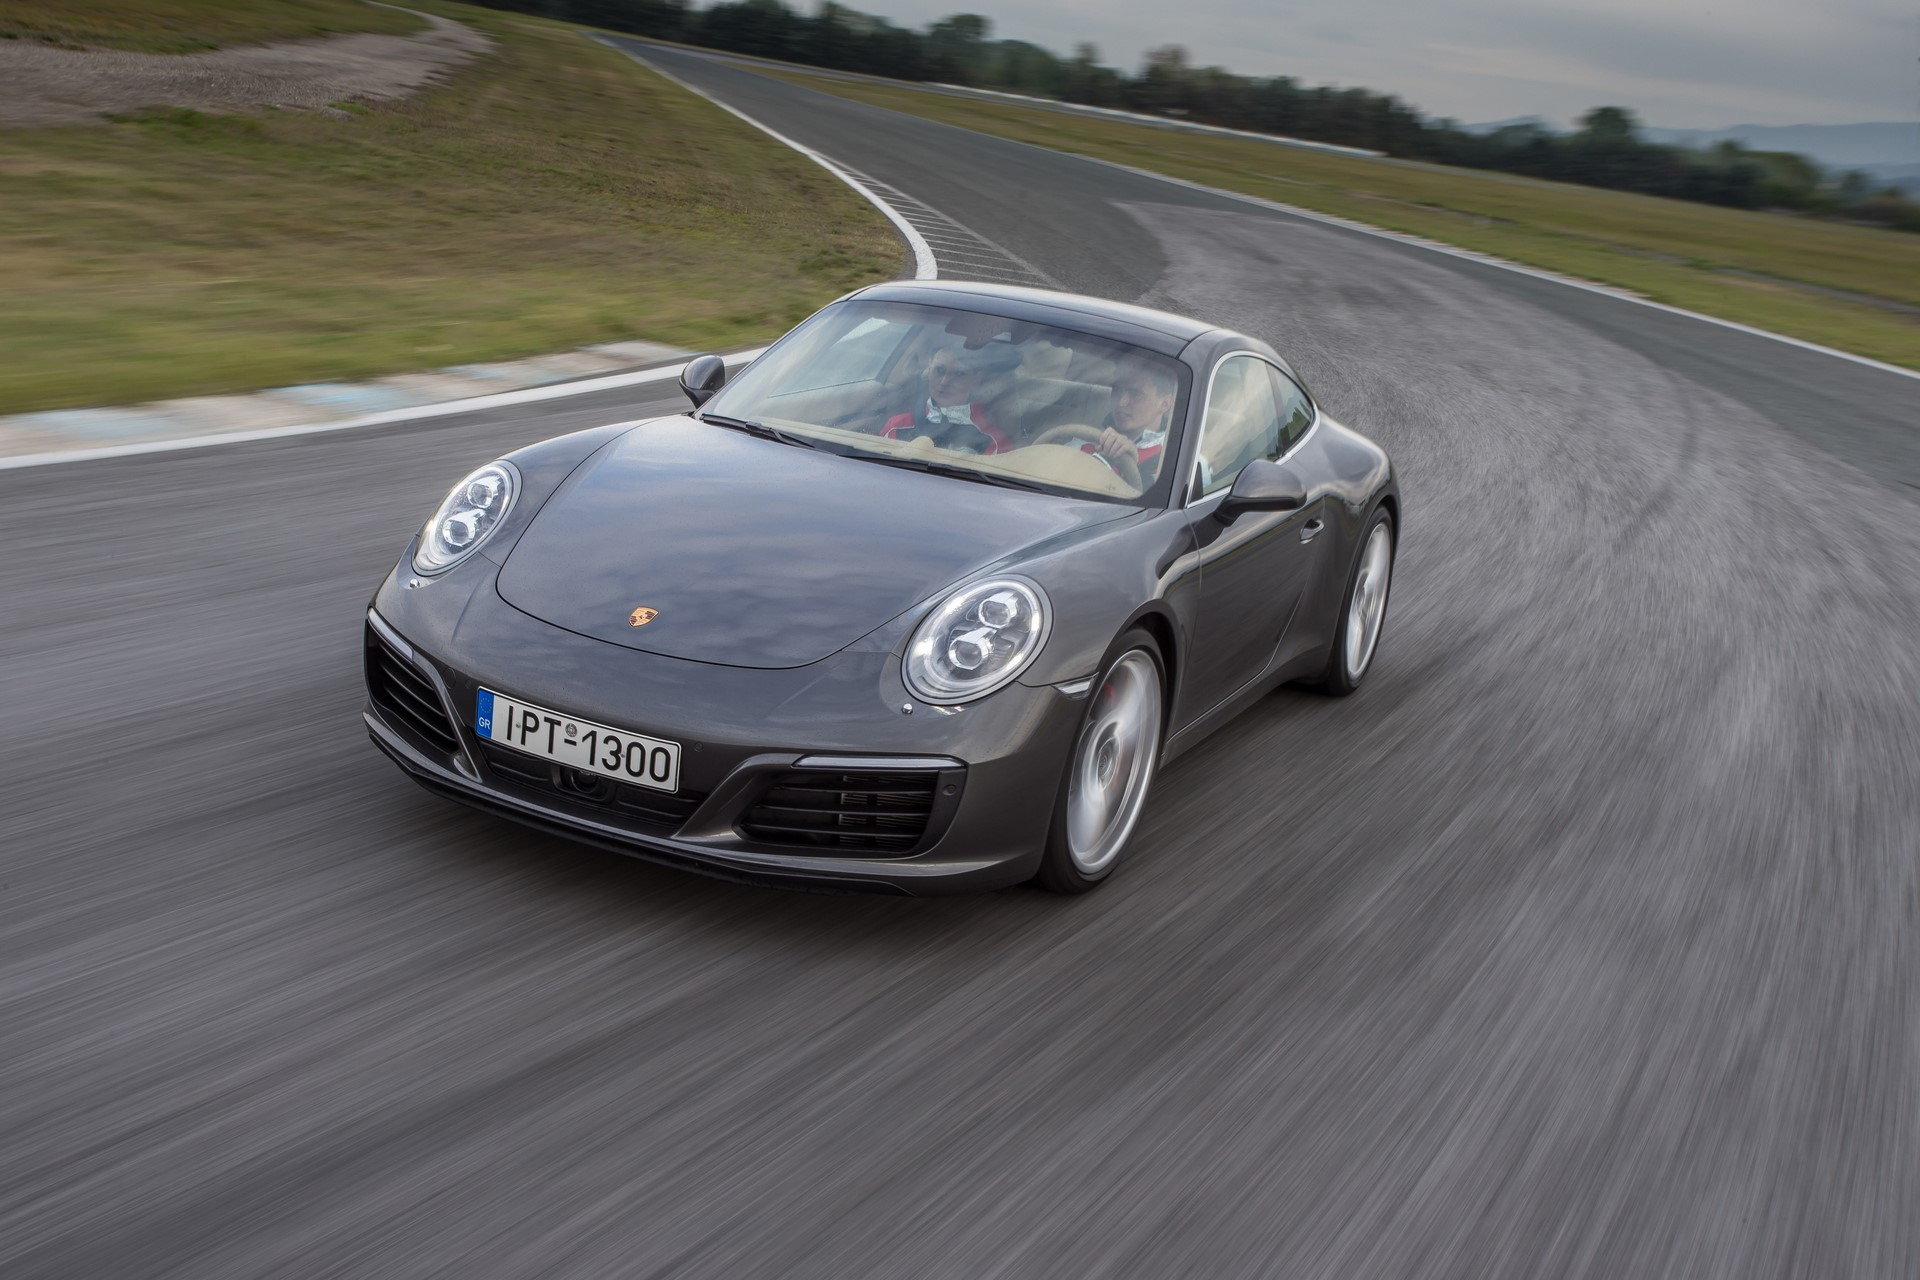 Porsche Driving Experience 2017 Serres (53)